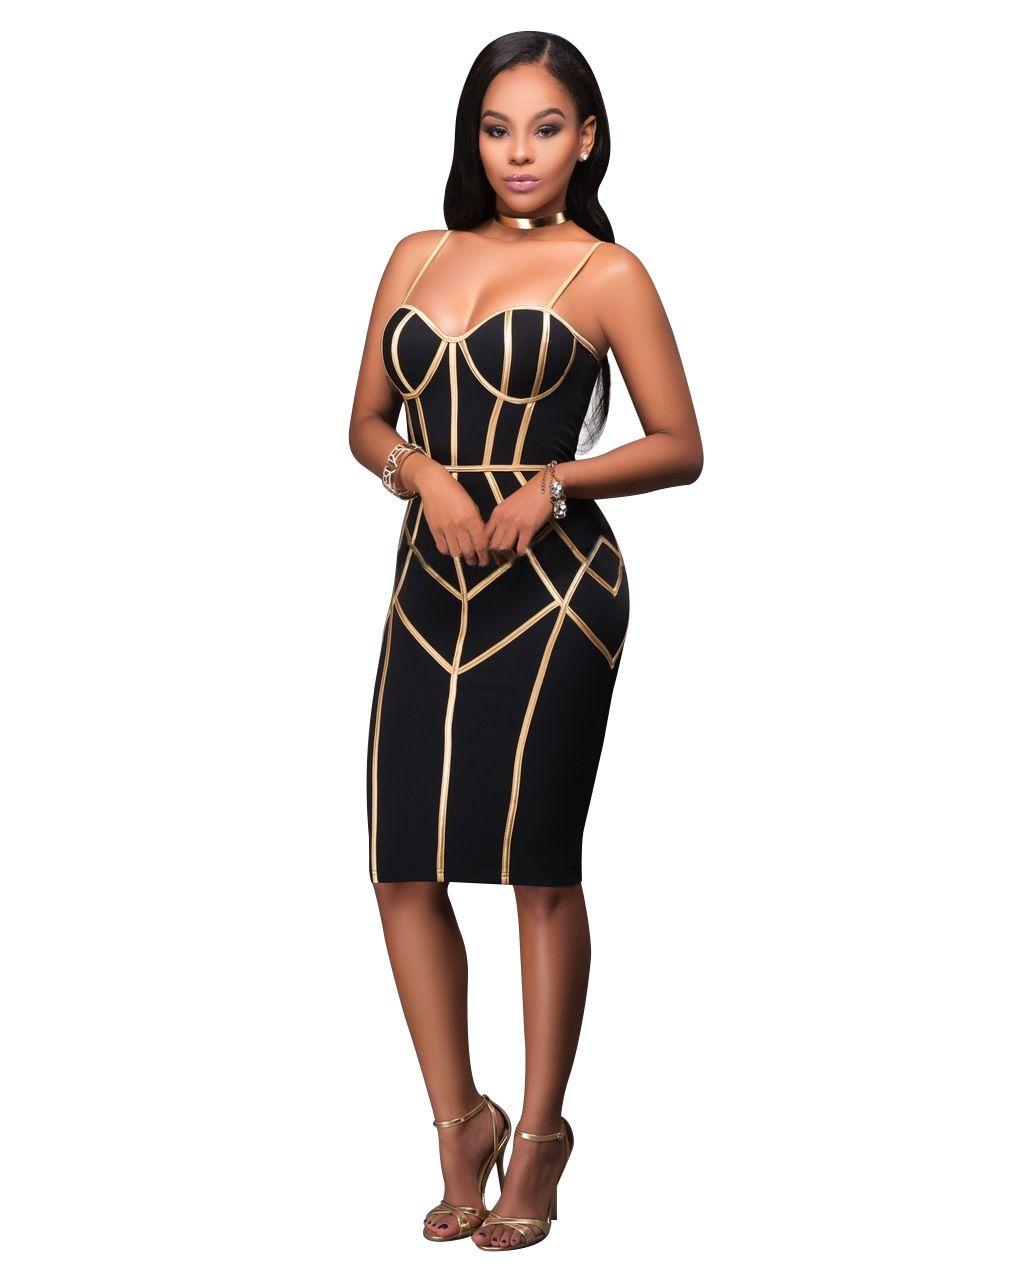 Feminino Preto e Alça de Ouro Zipper Bandage Keen-comprimento Vestido Mulheres Sexy Sem Mangas Bodycon Club Wear Vestidos Casuais